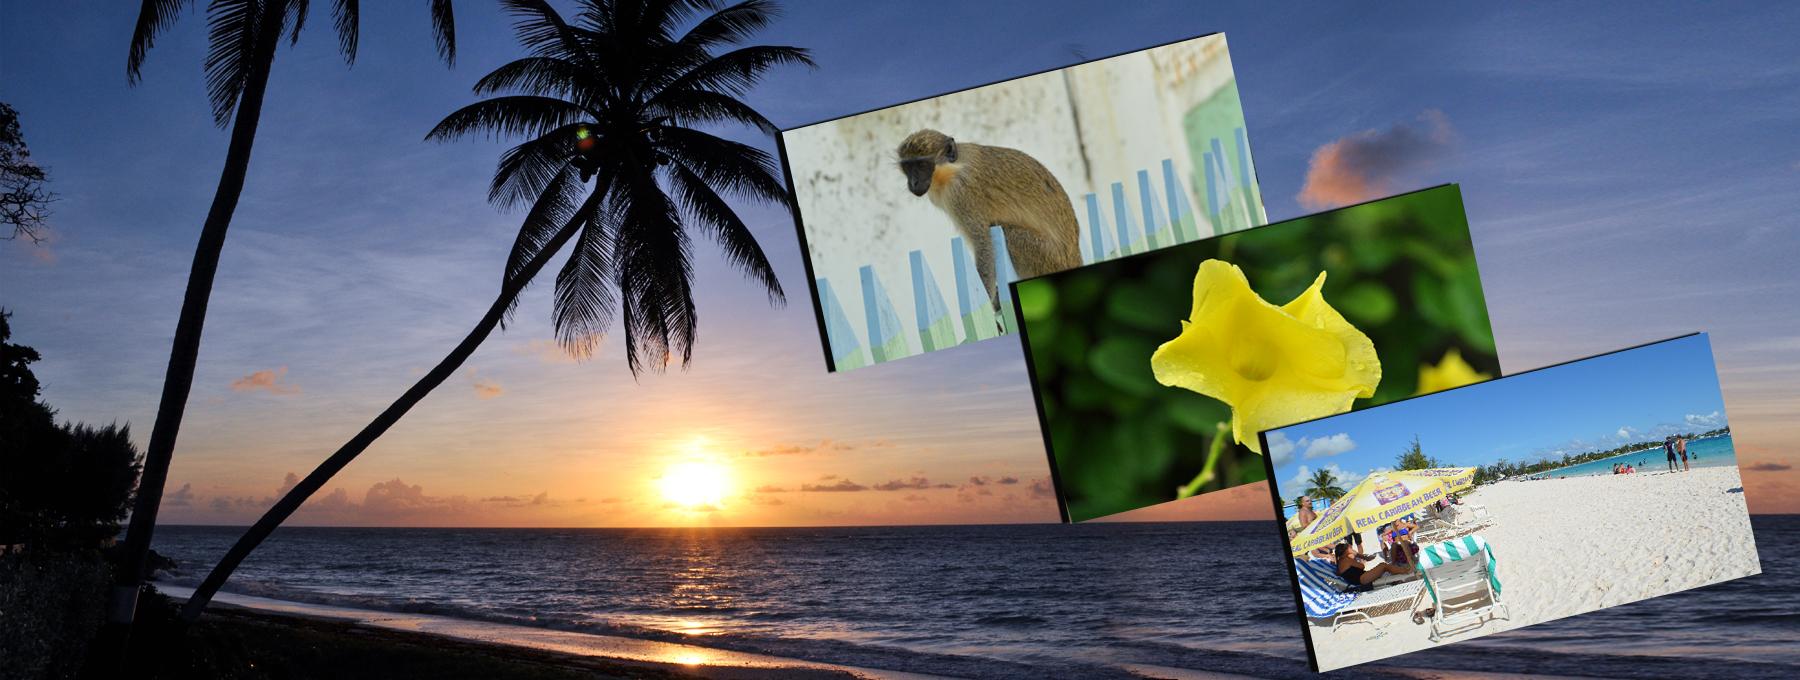 Barbados accommodations